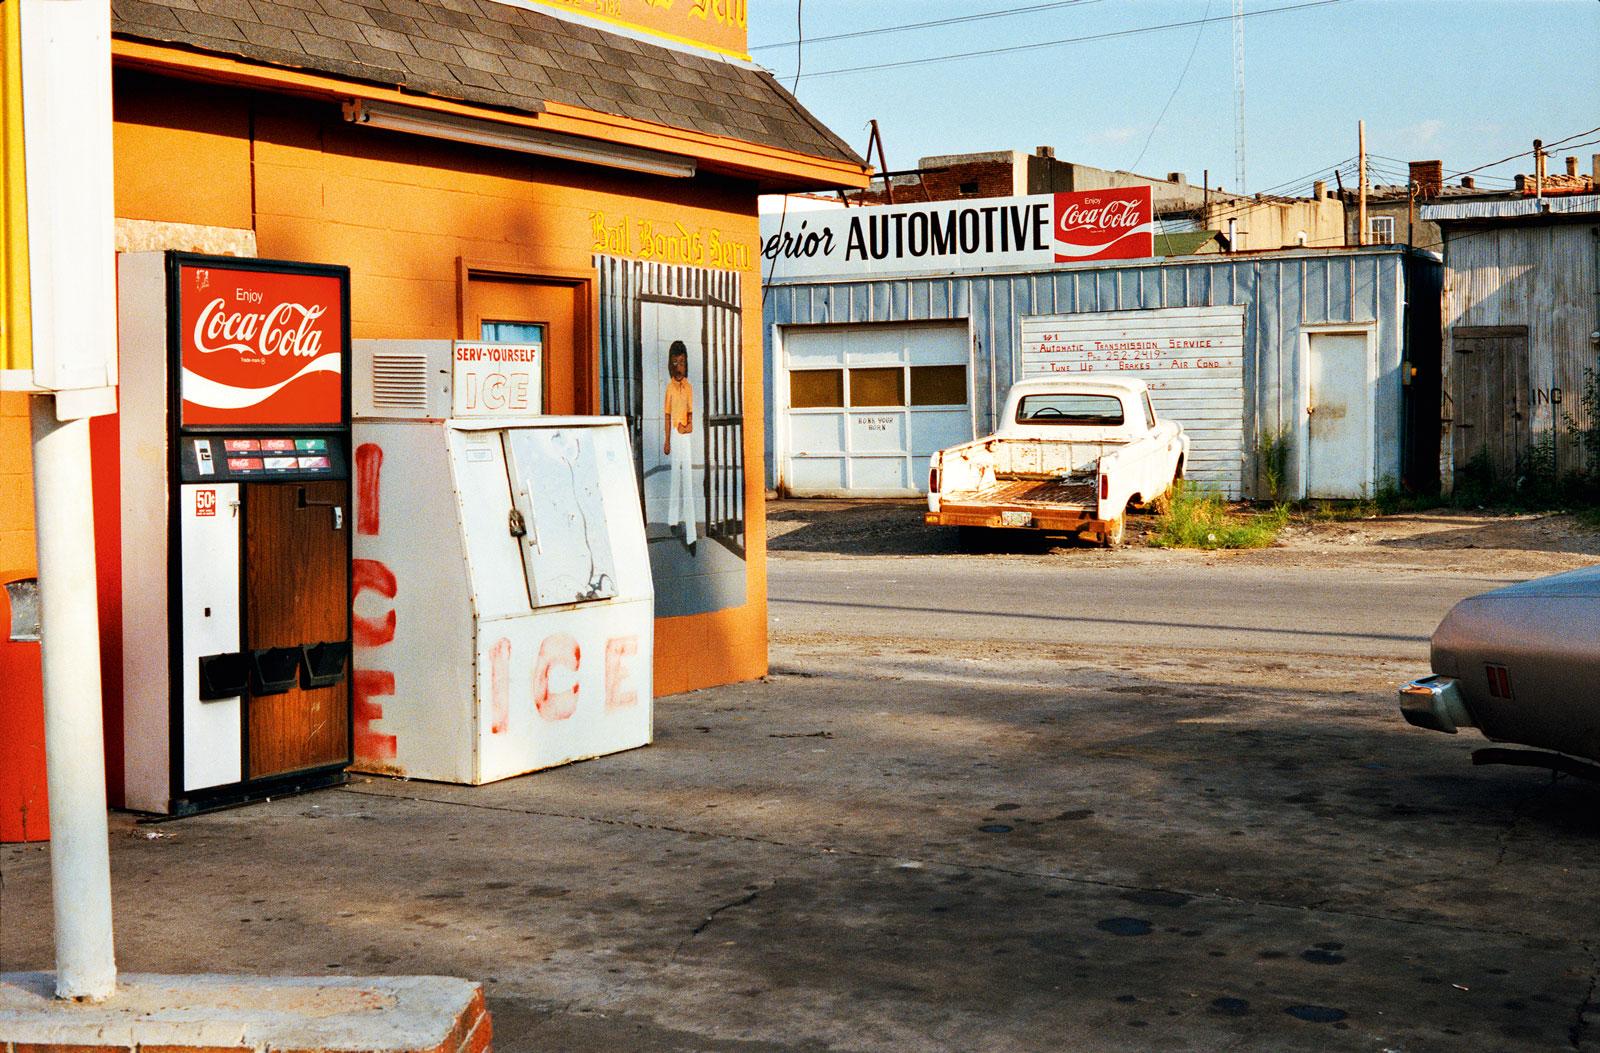 William Eggleston: <em>Untitled</em> from <em>The Democratic Forest</em>, 1983-1986